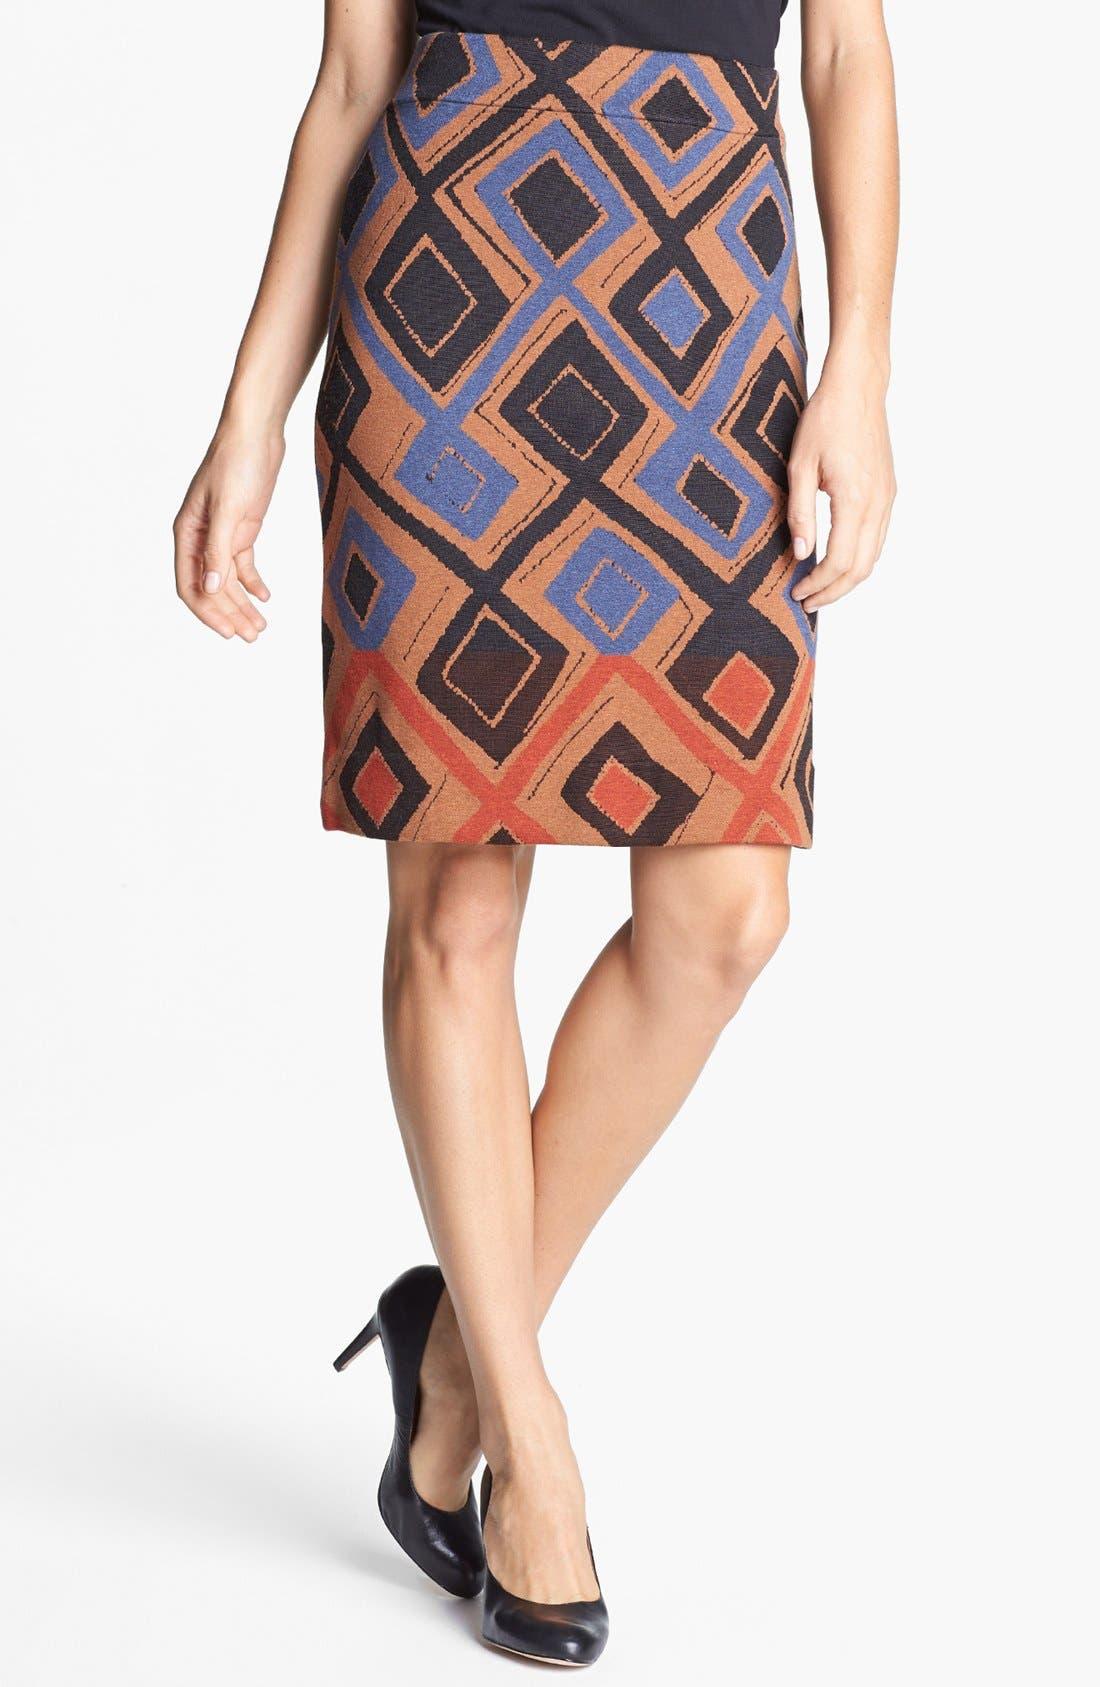 Alternate Image 1 Selected - NIC+ZOE 'Falling Diamonds Wink' Skirt (Petite)